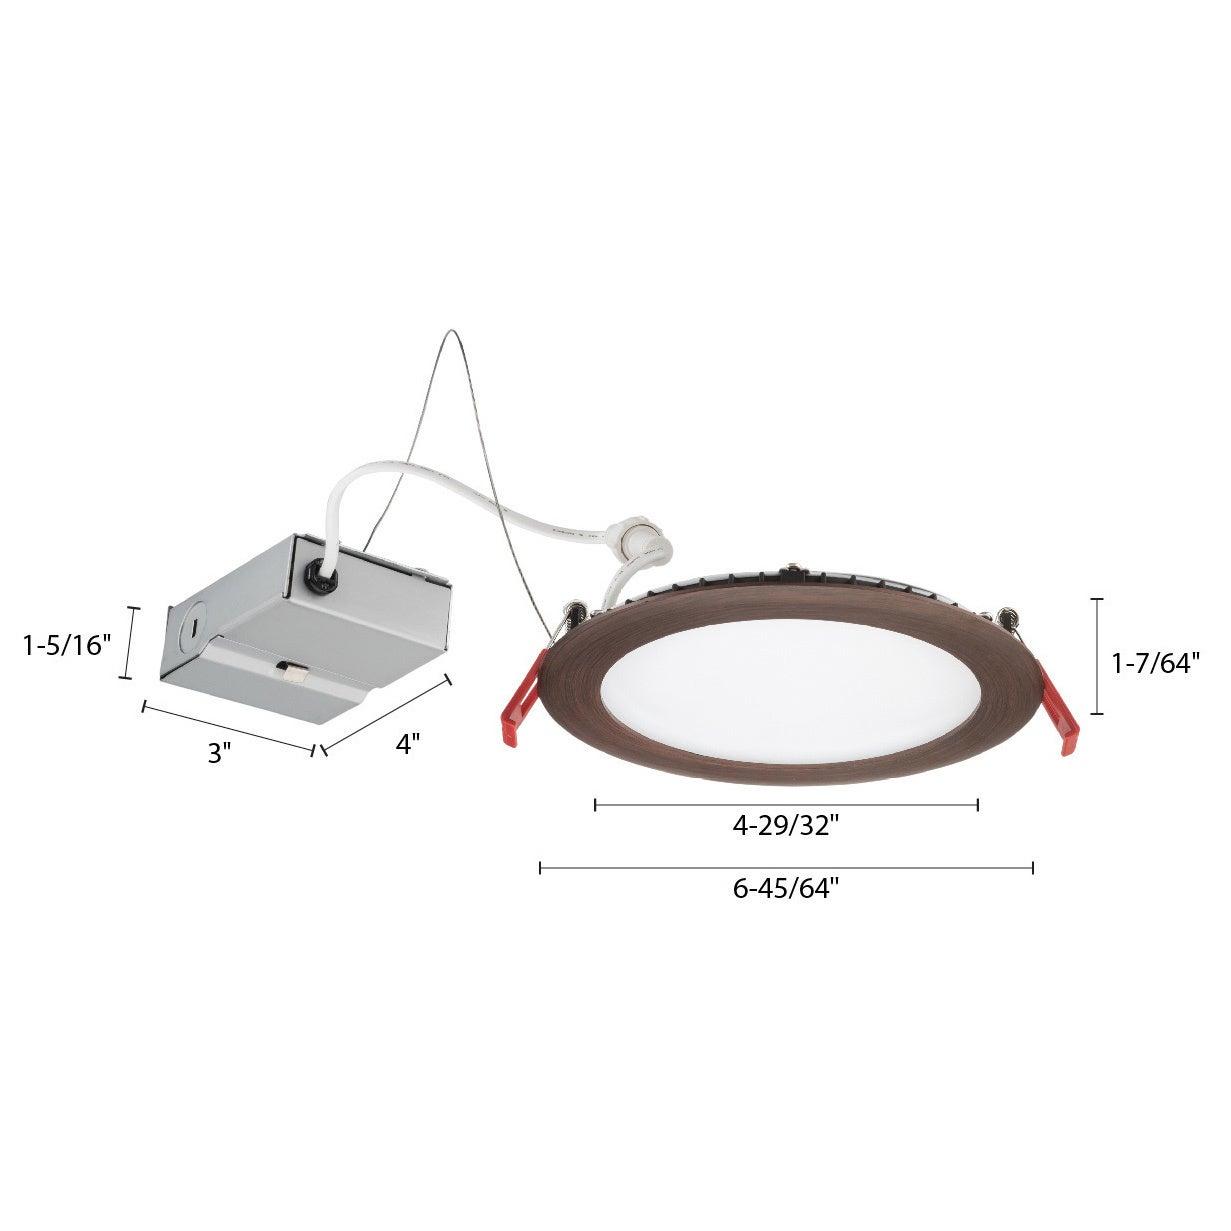 CAT40 45/° Angle Coolant Thru Retention Knob.190 Hole 5//8-11 Thread Size RedLine Tools RC4HRKC